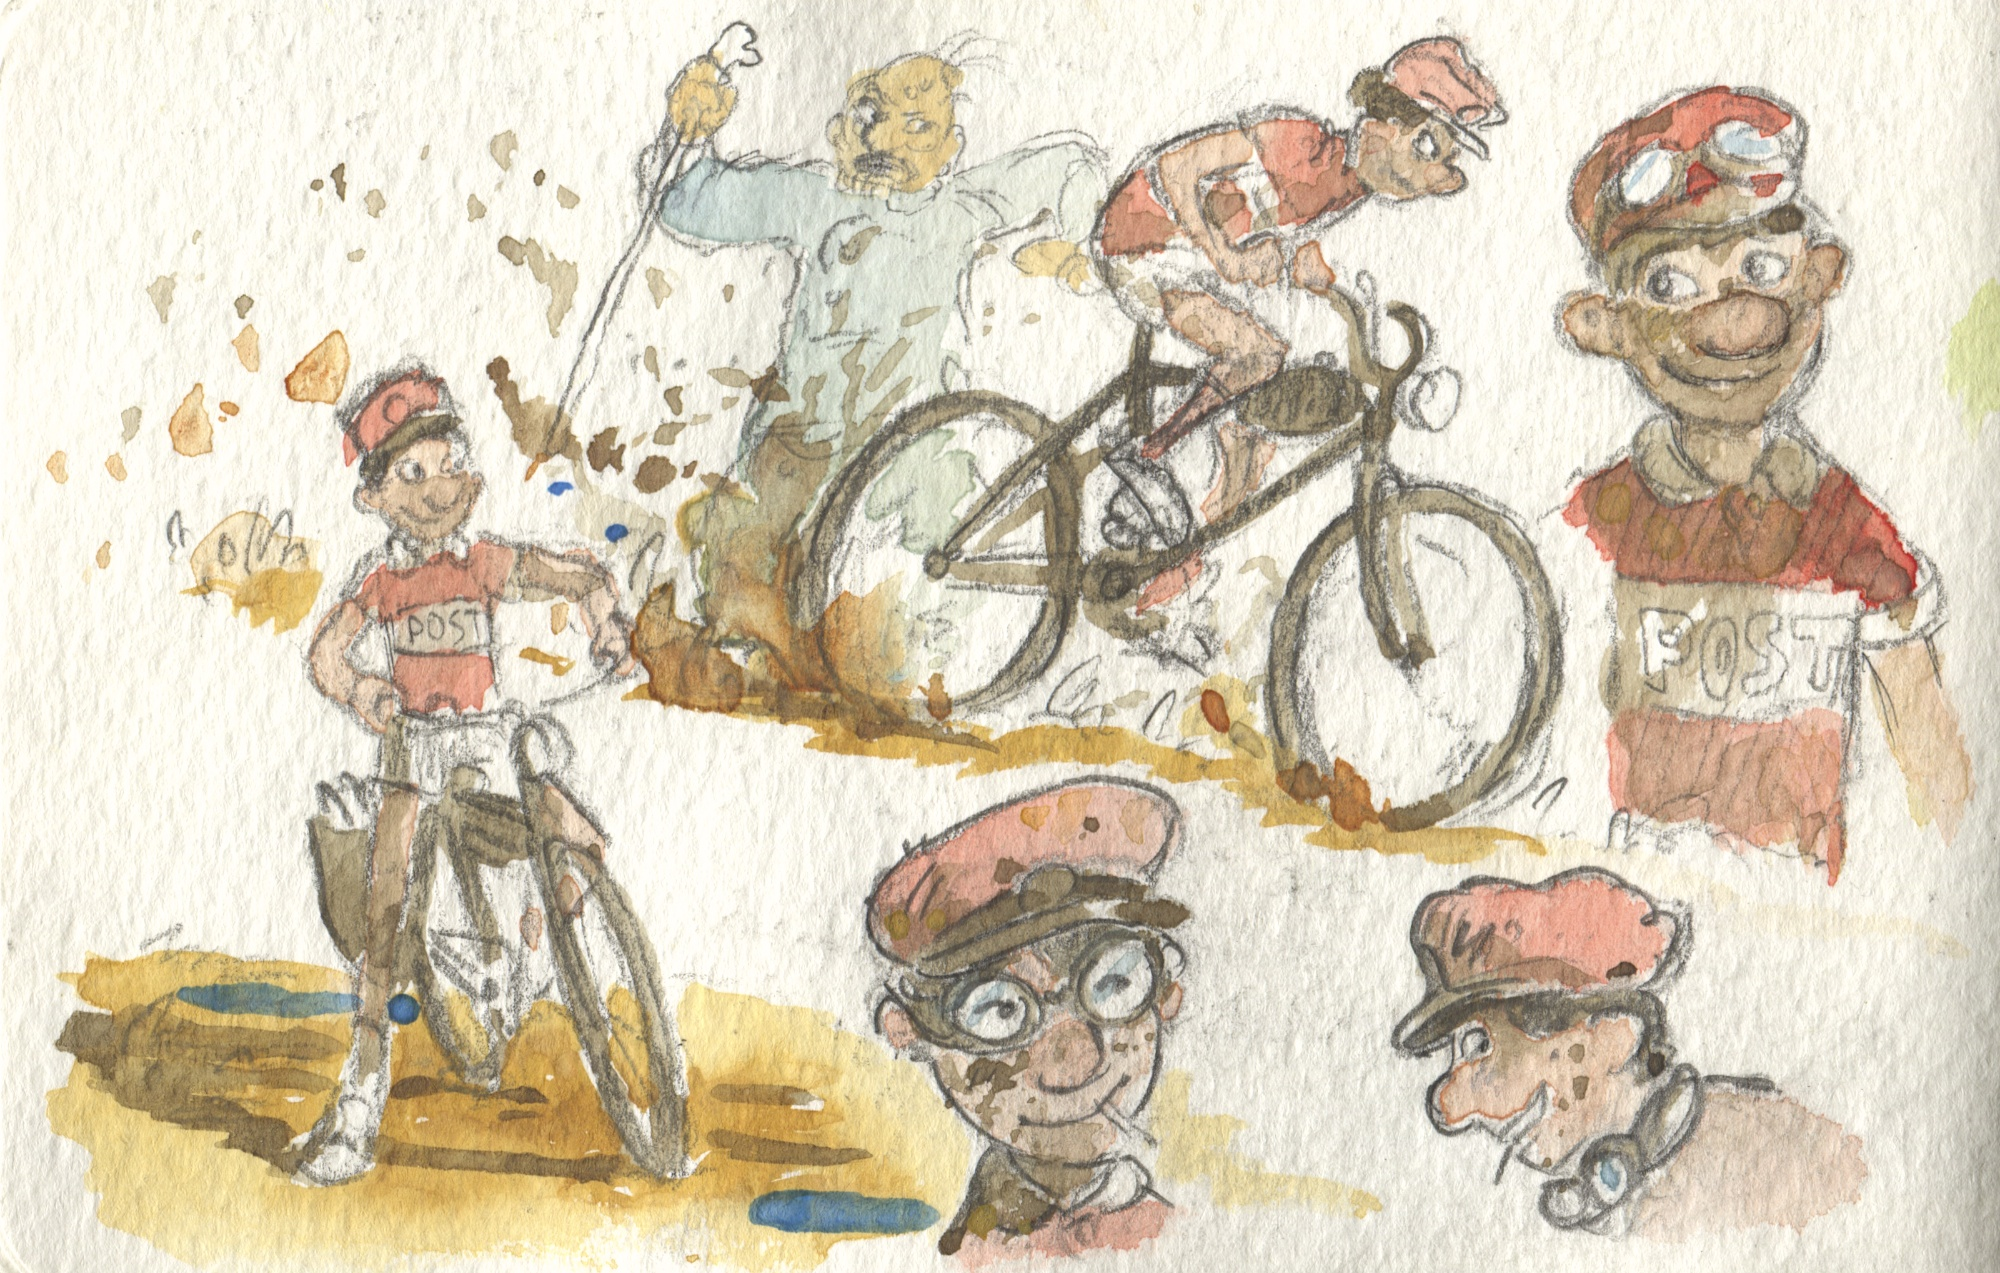 a boy and his bike